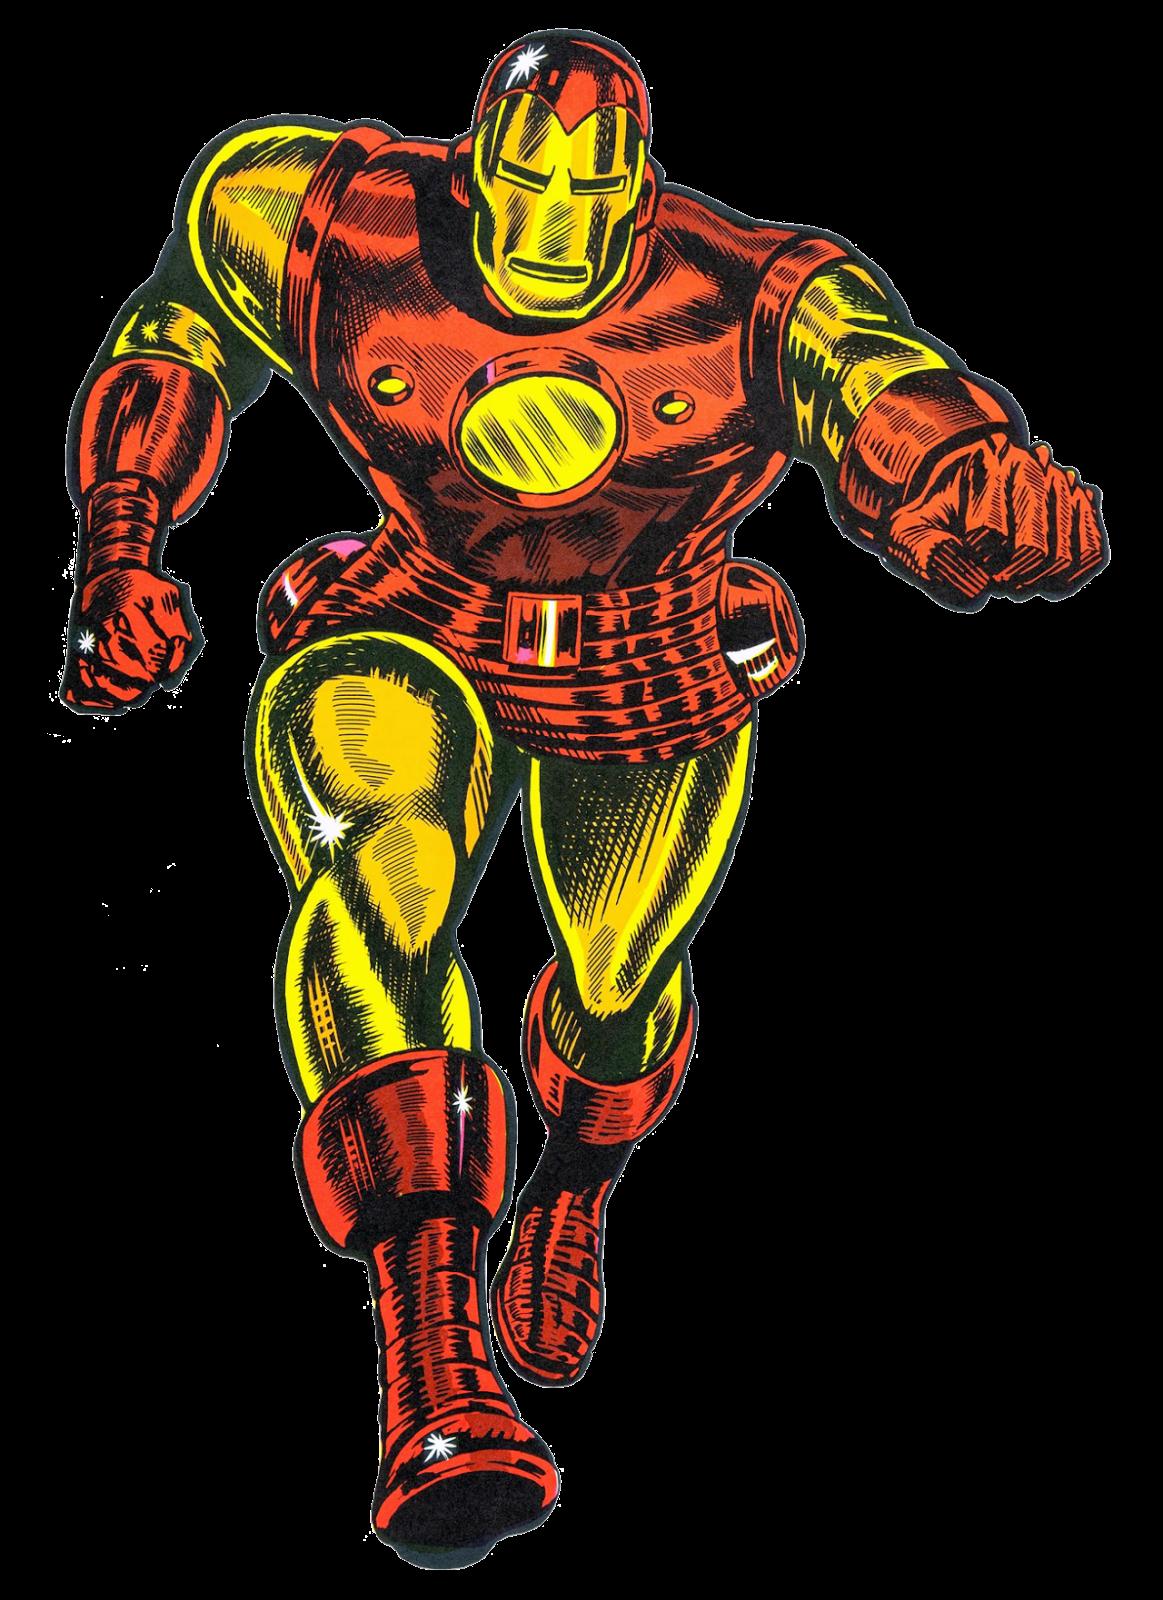 Iron man thor superhero. Torch clipart academic